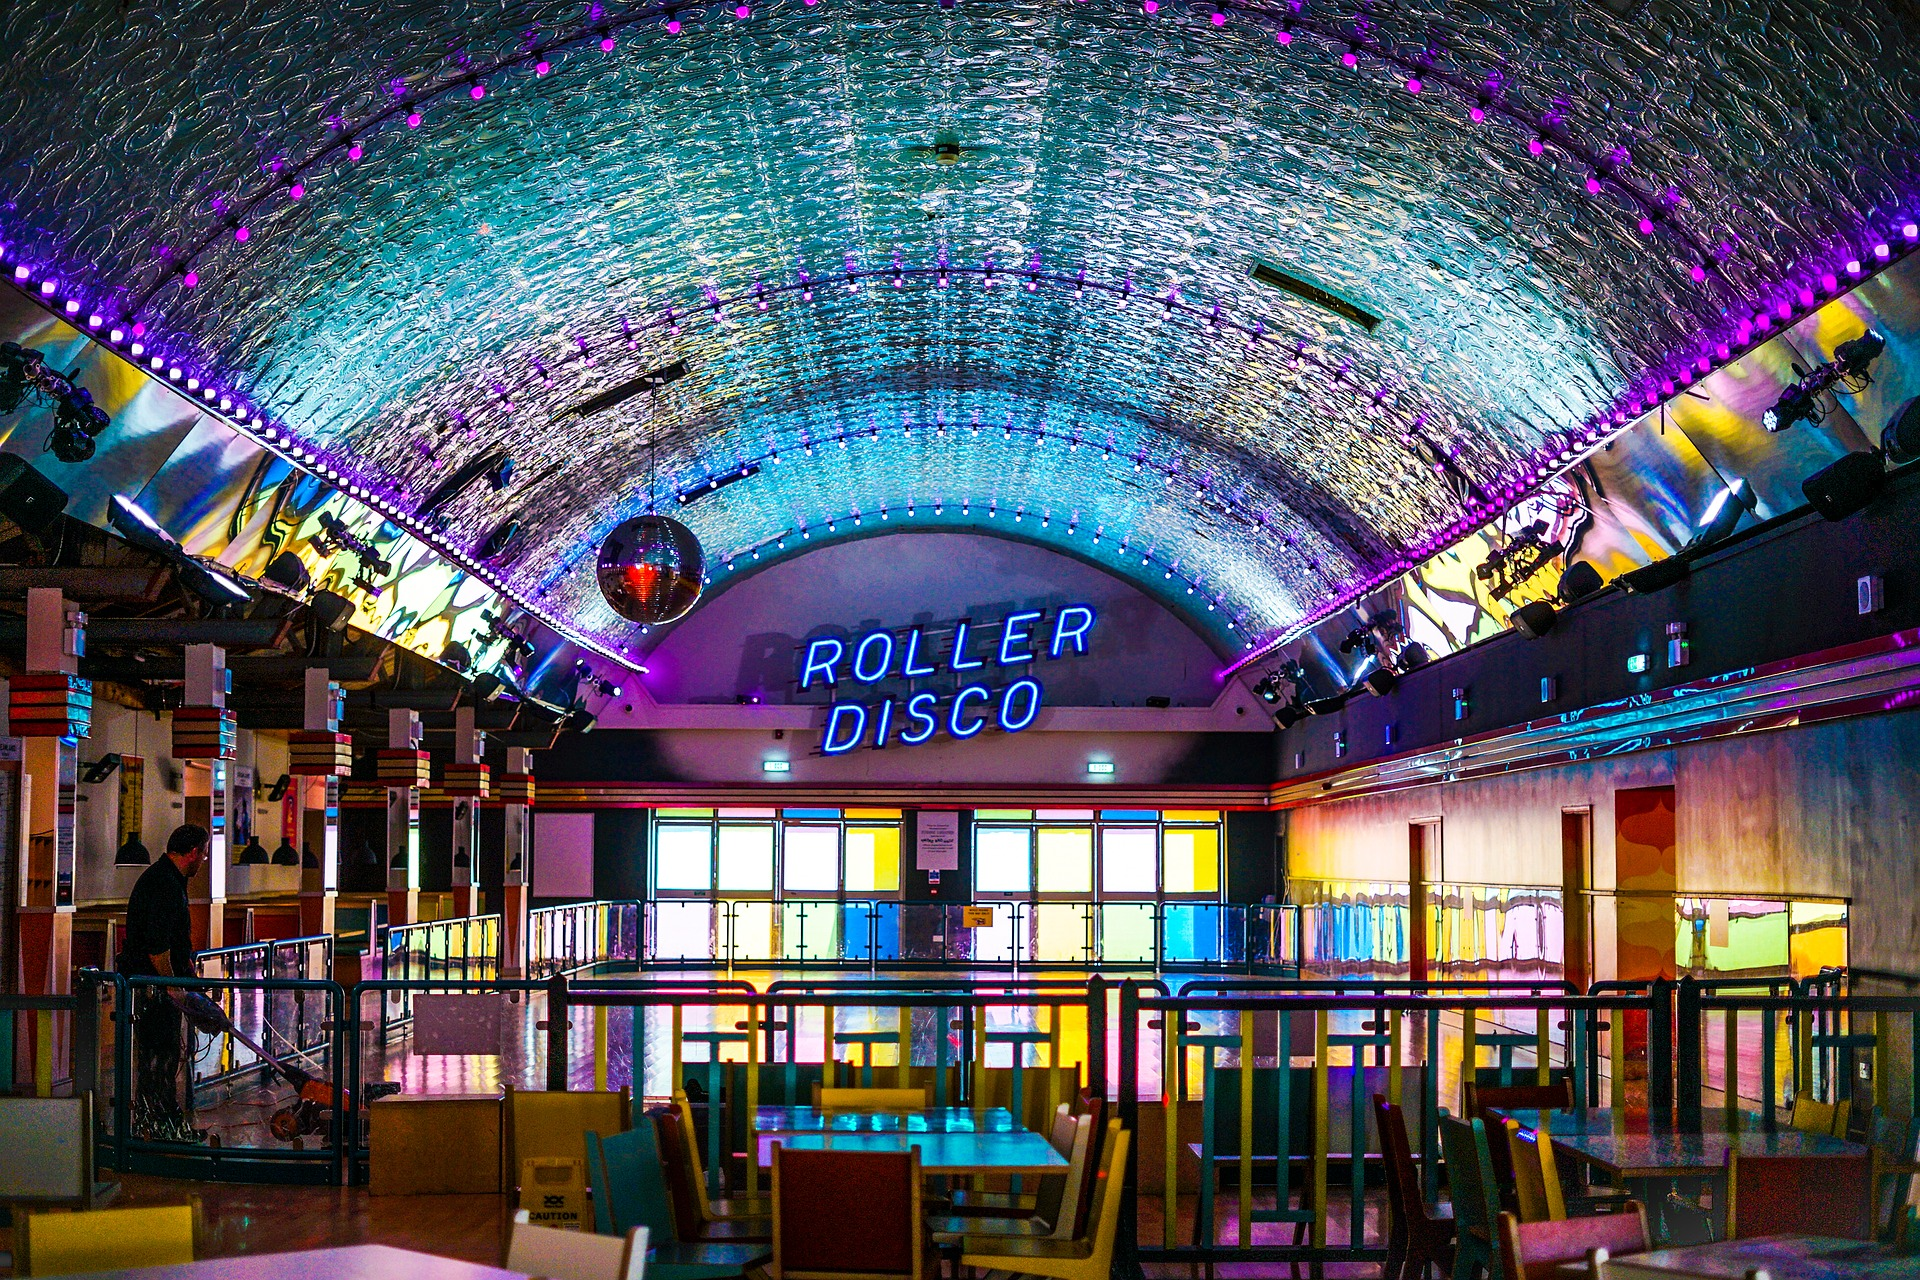 Roller disco at Belvederes Ultra Dive